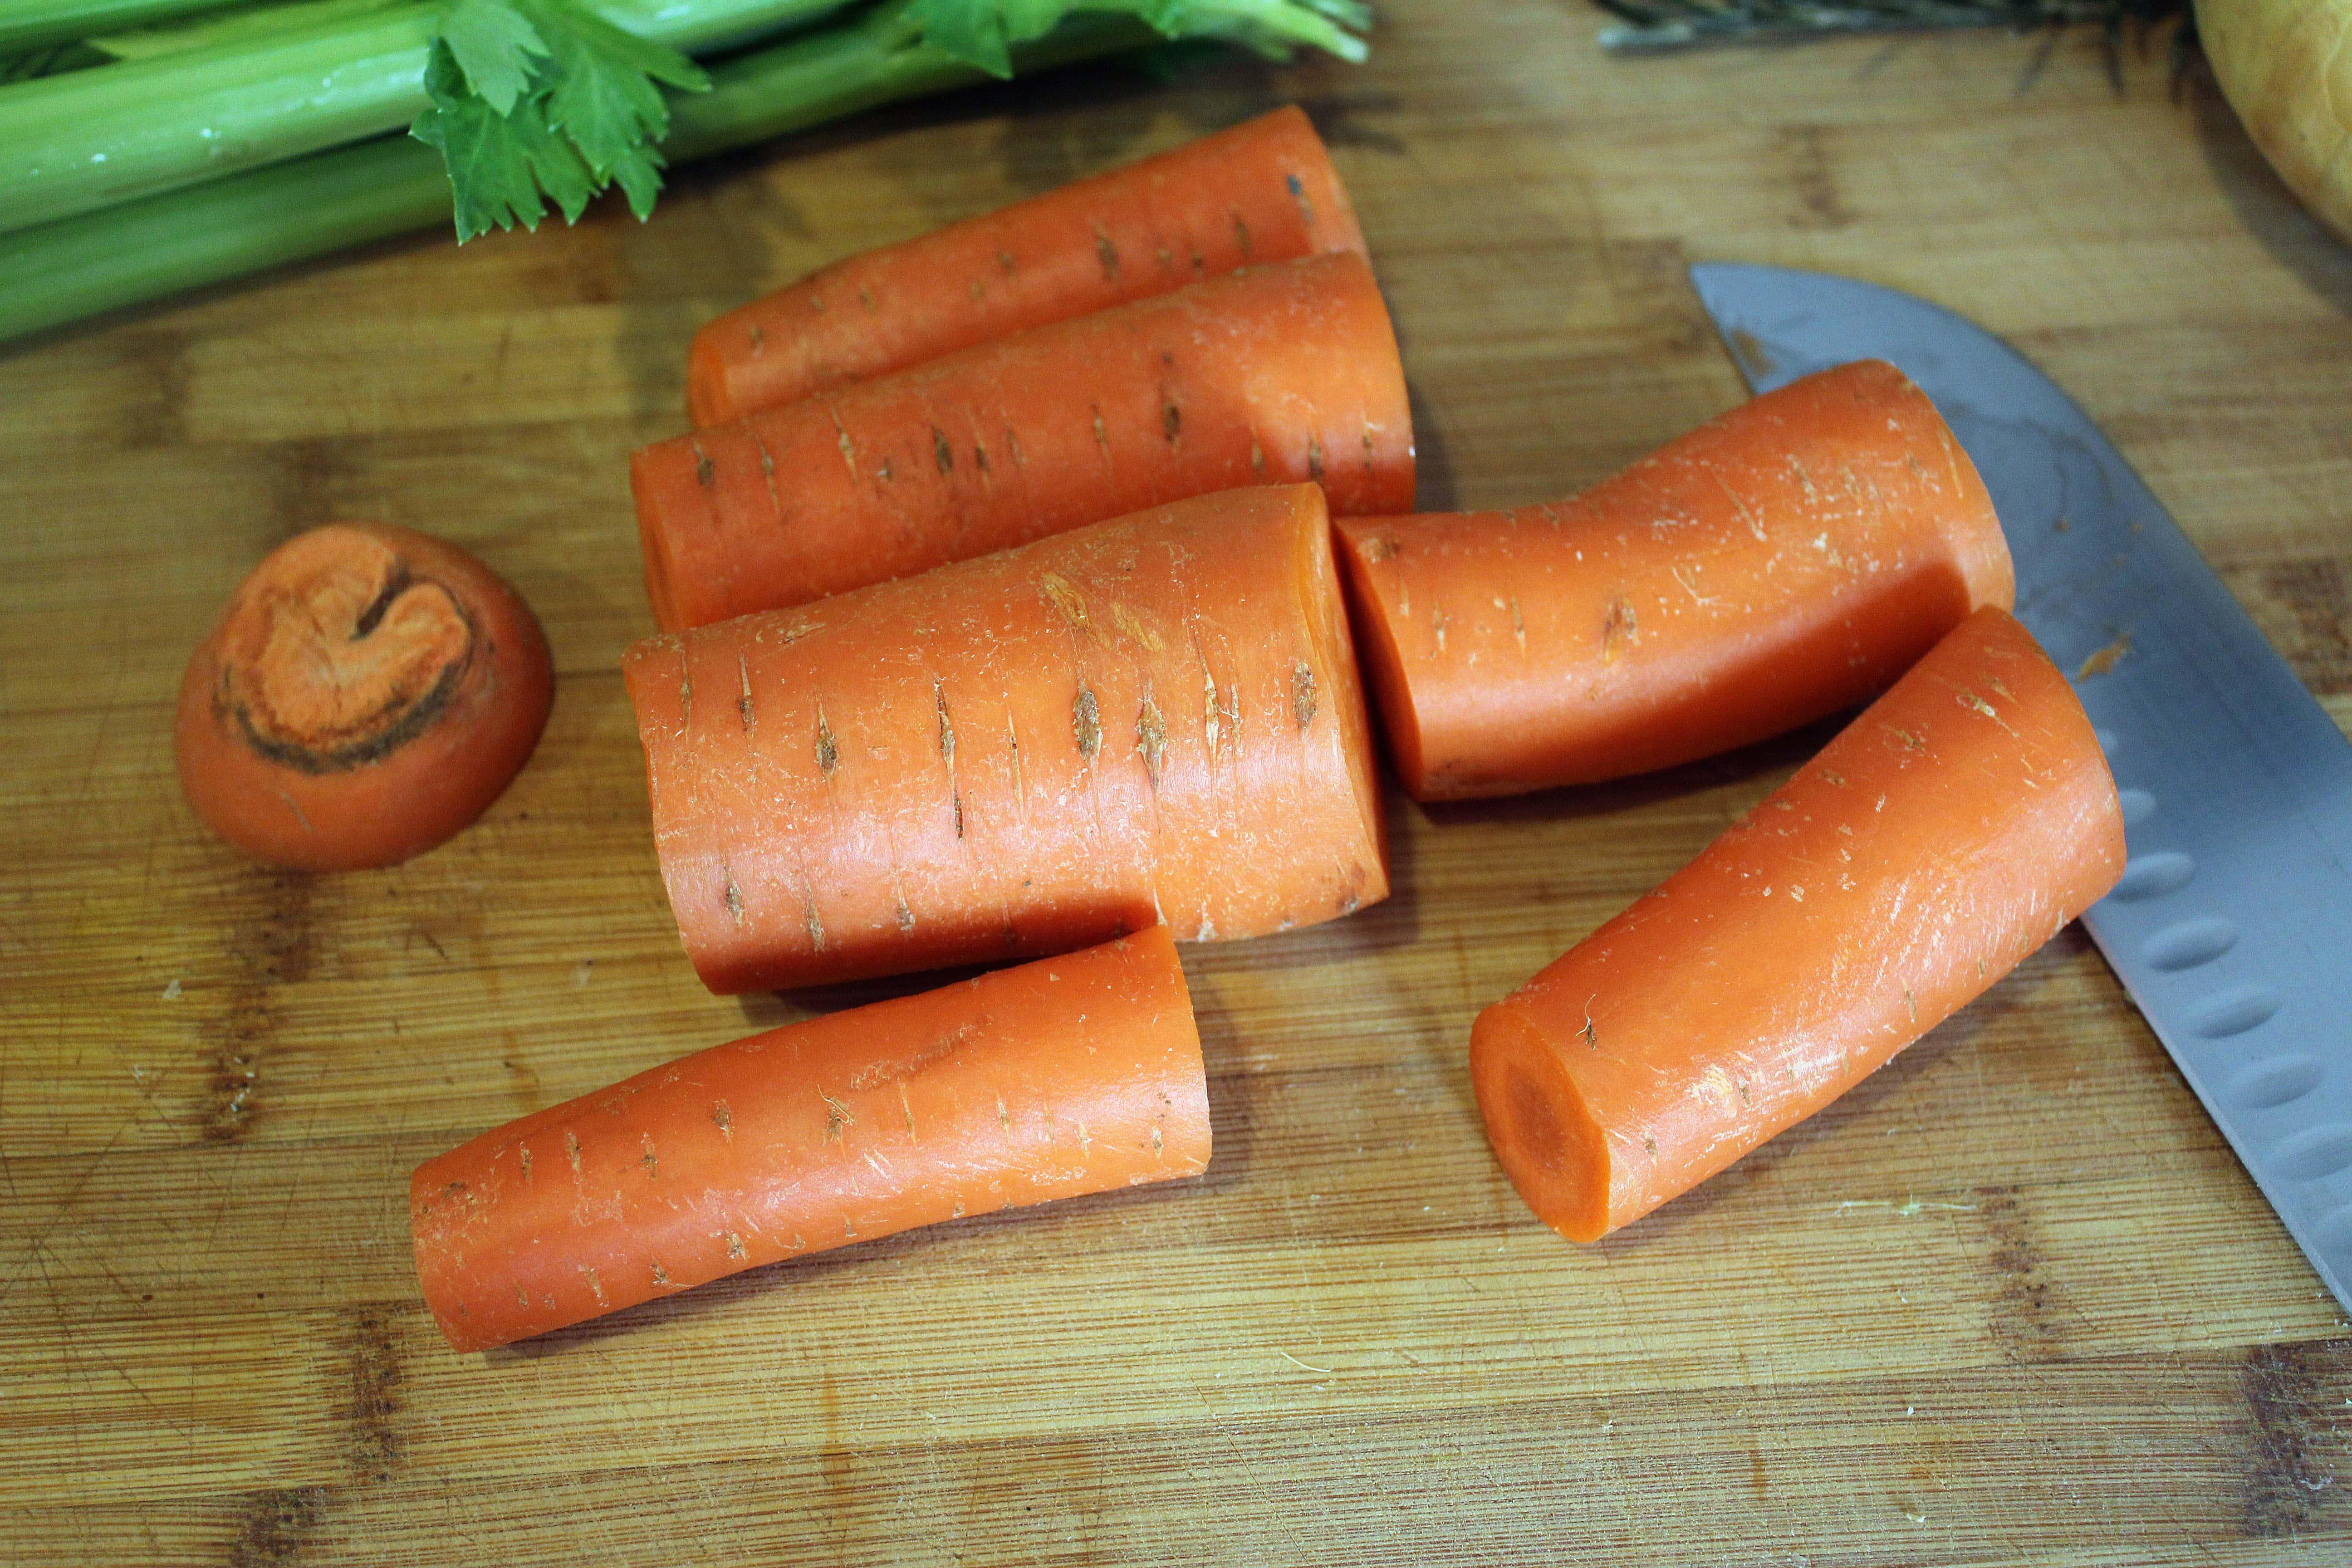 Cut carrots into chunks